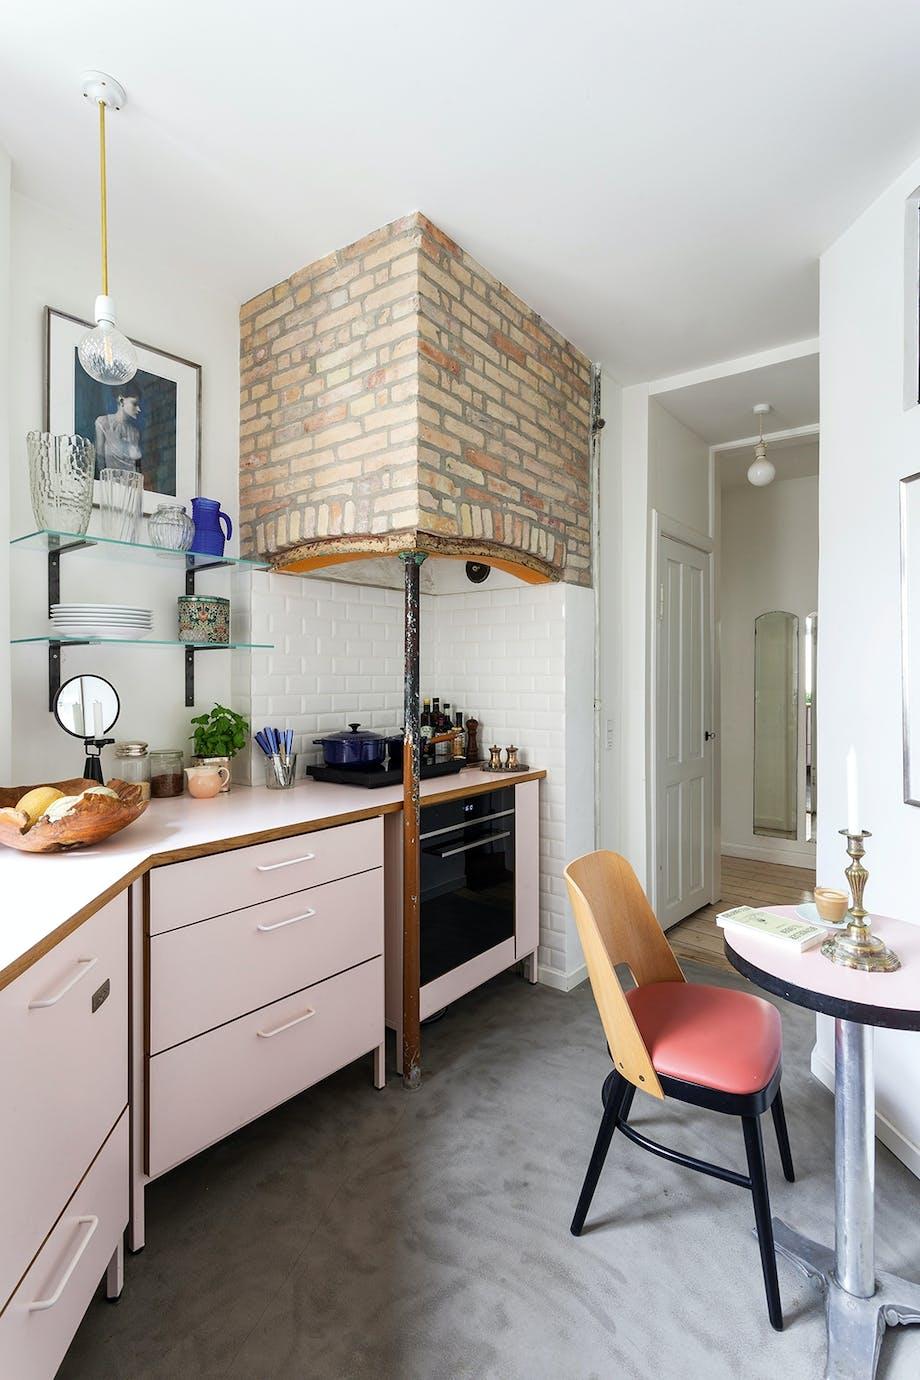 Køkken mursten ildsted lyserød vintage